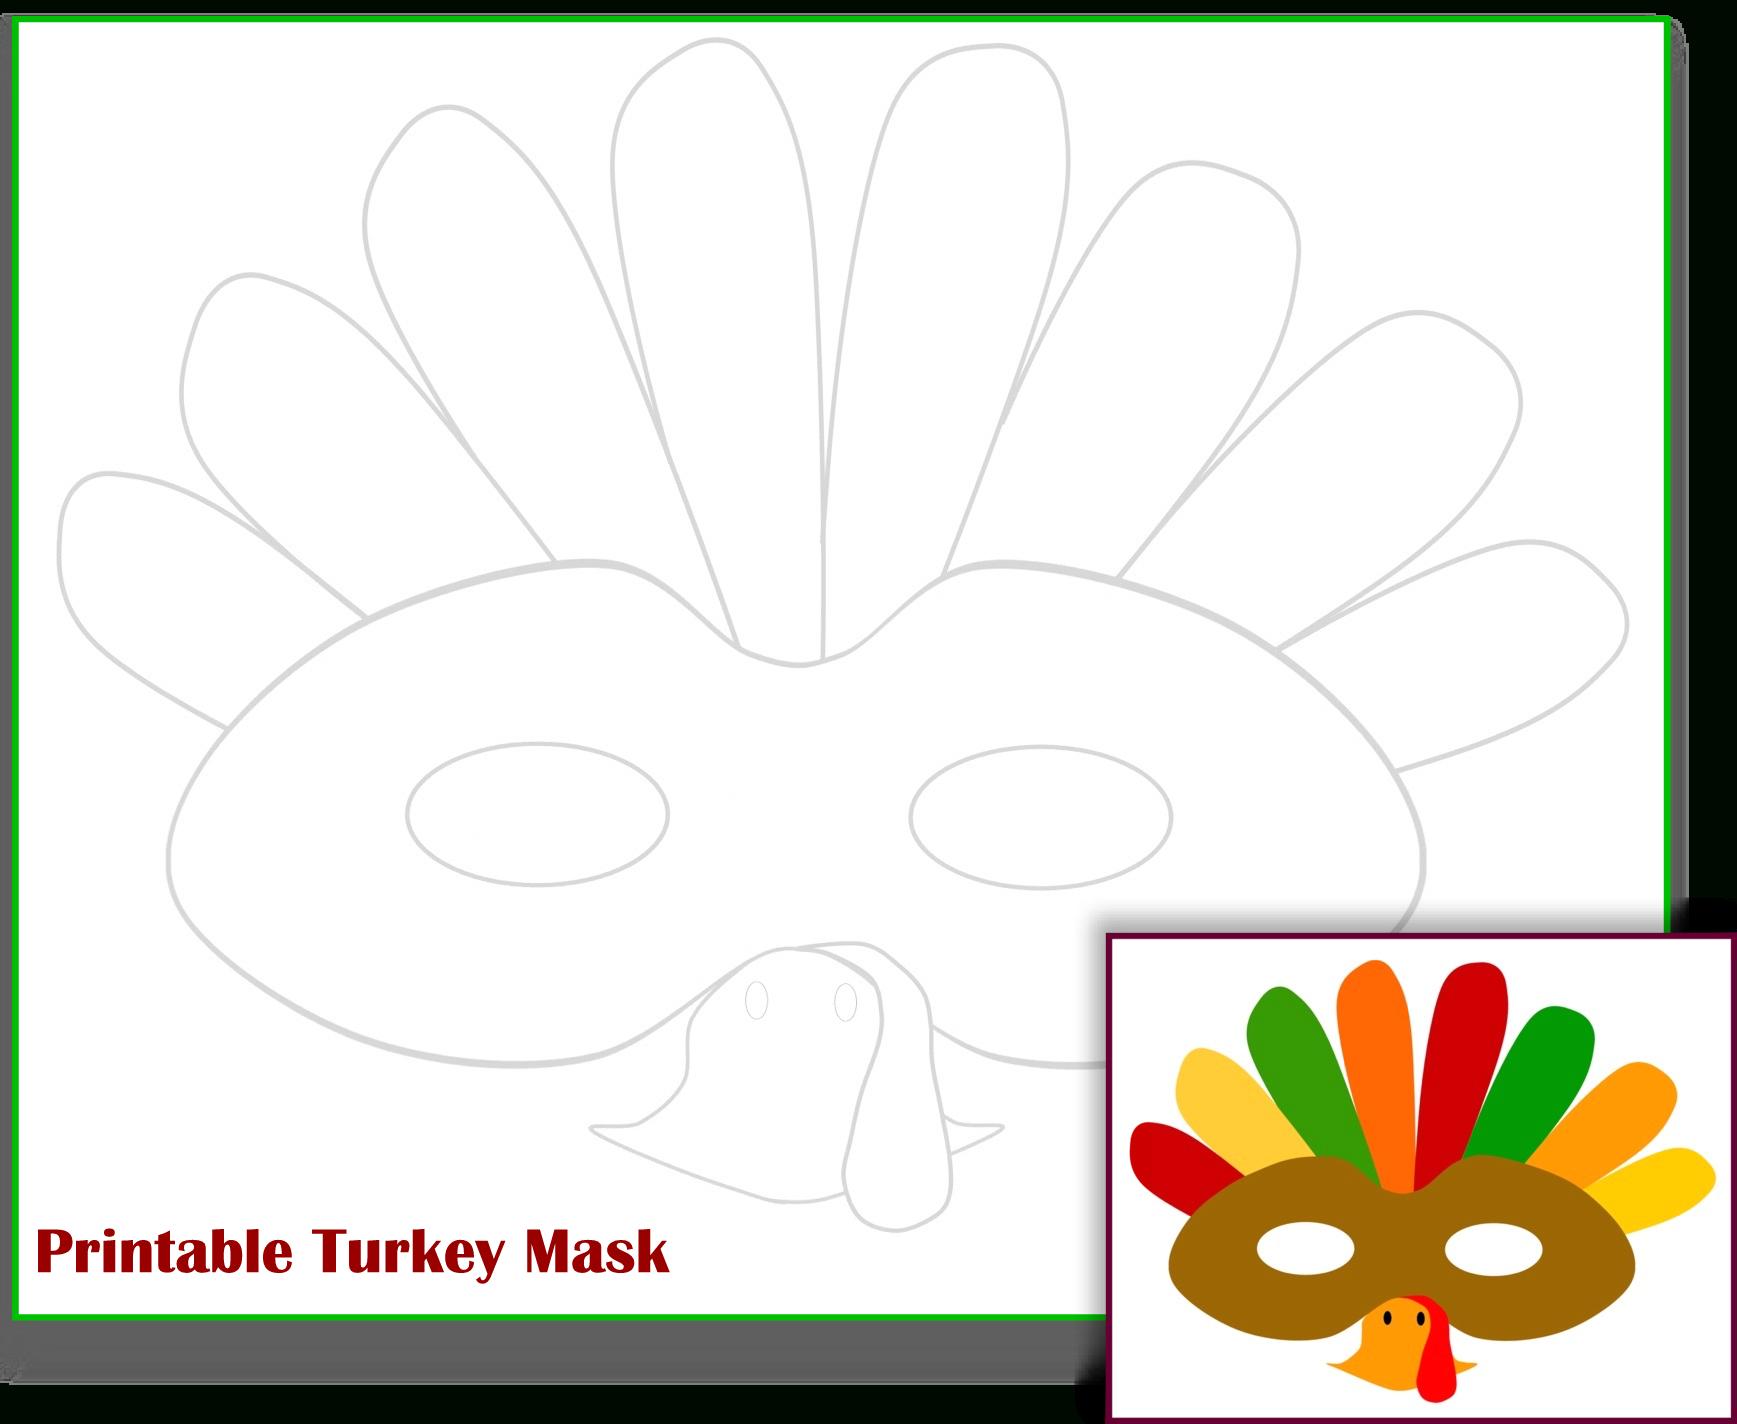 Free Printable Turkey Mask Template | The Mama Zone - Free Printable Turkey Template